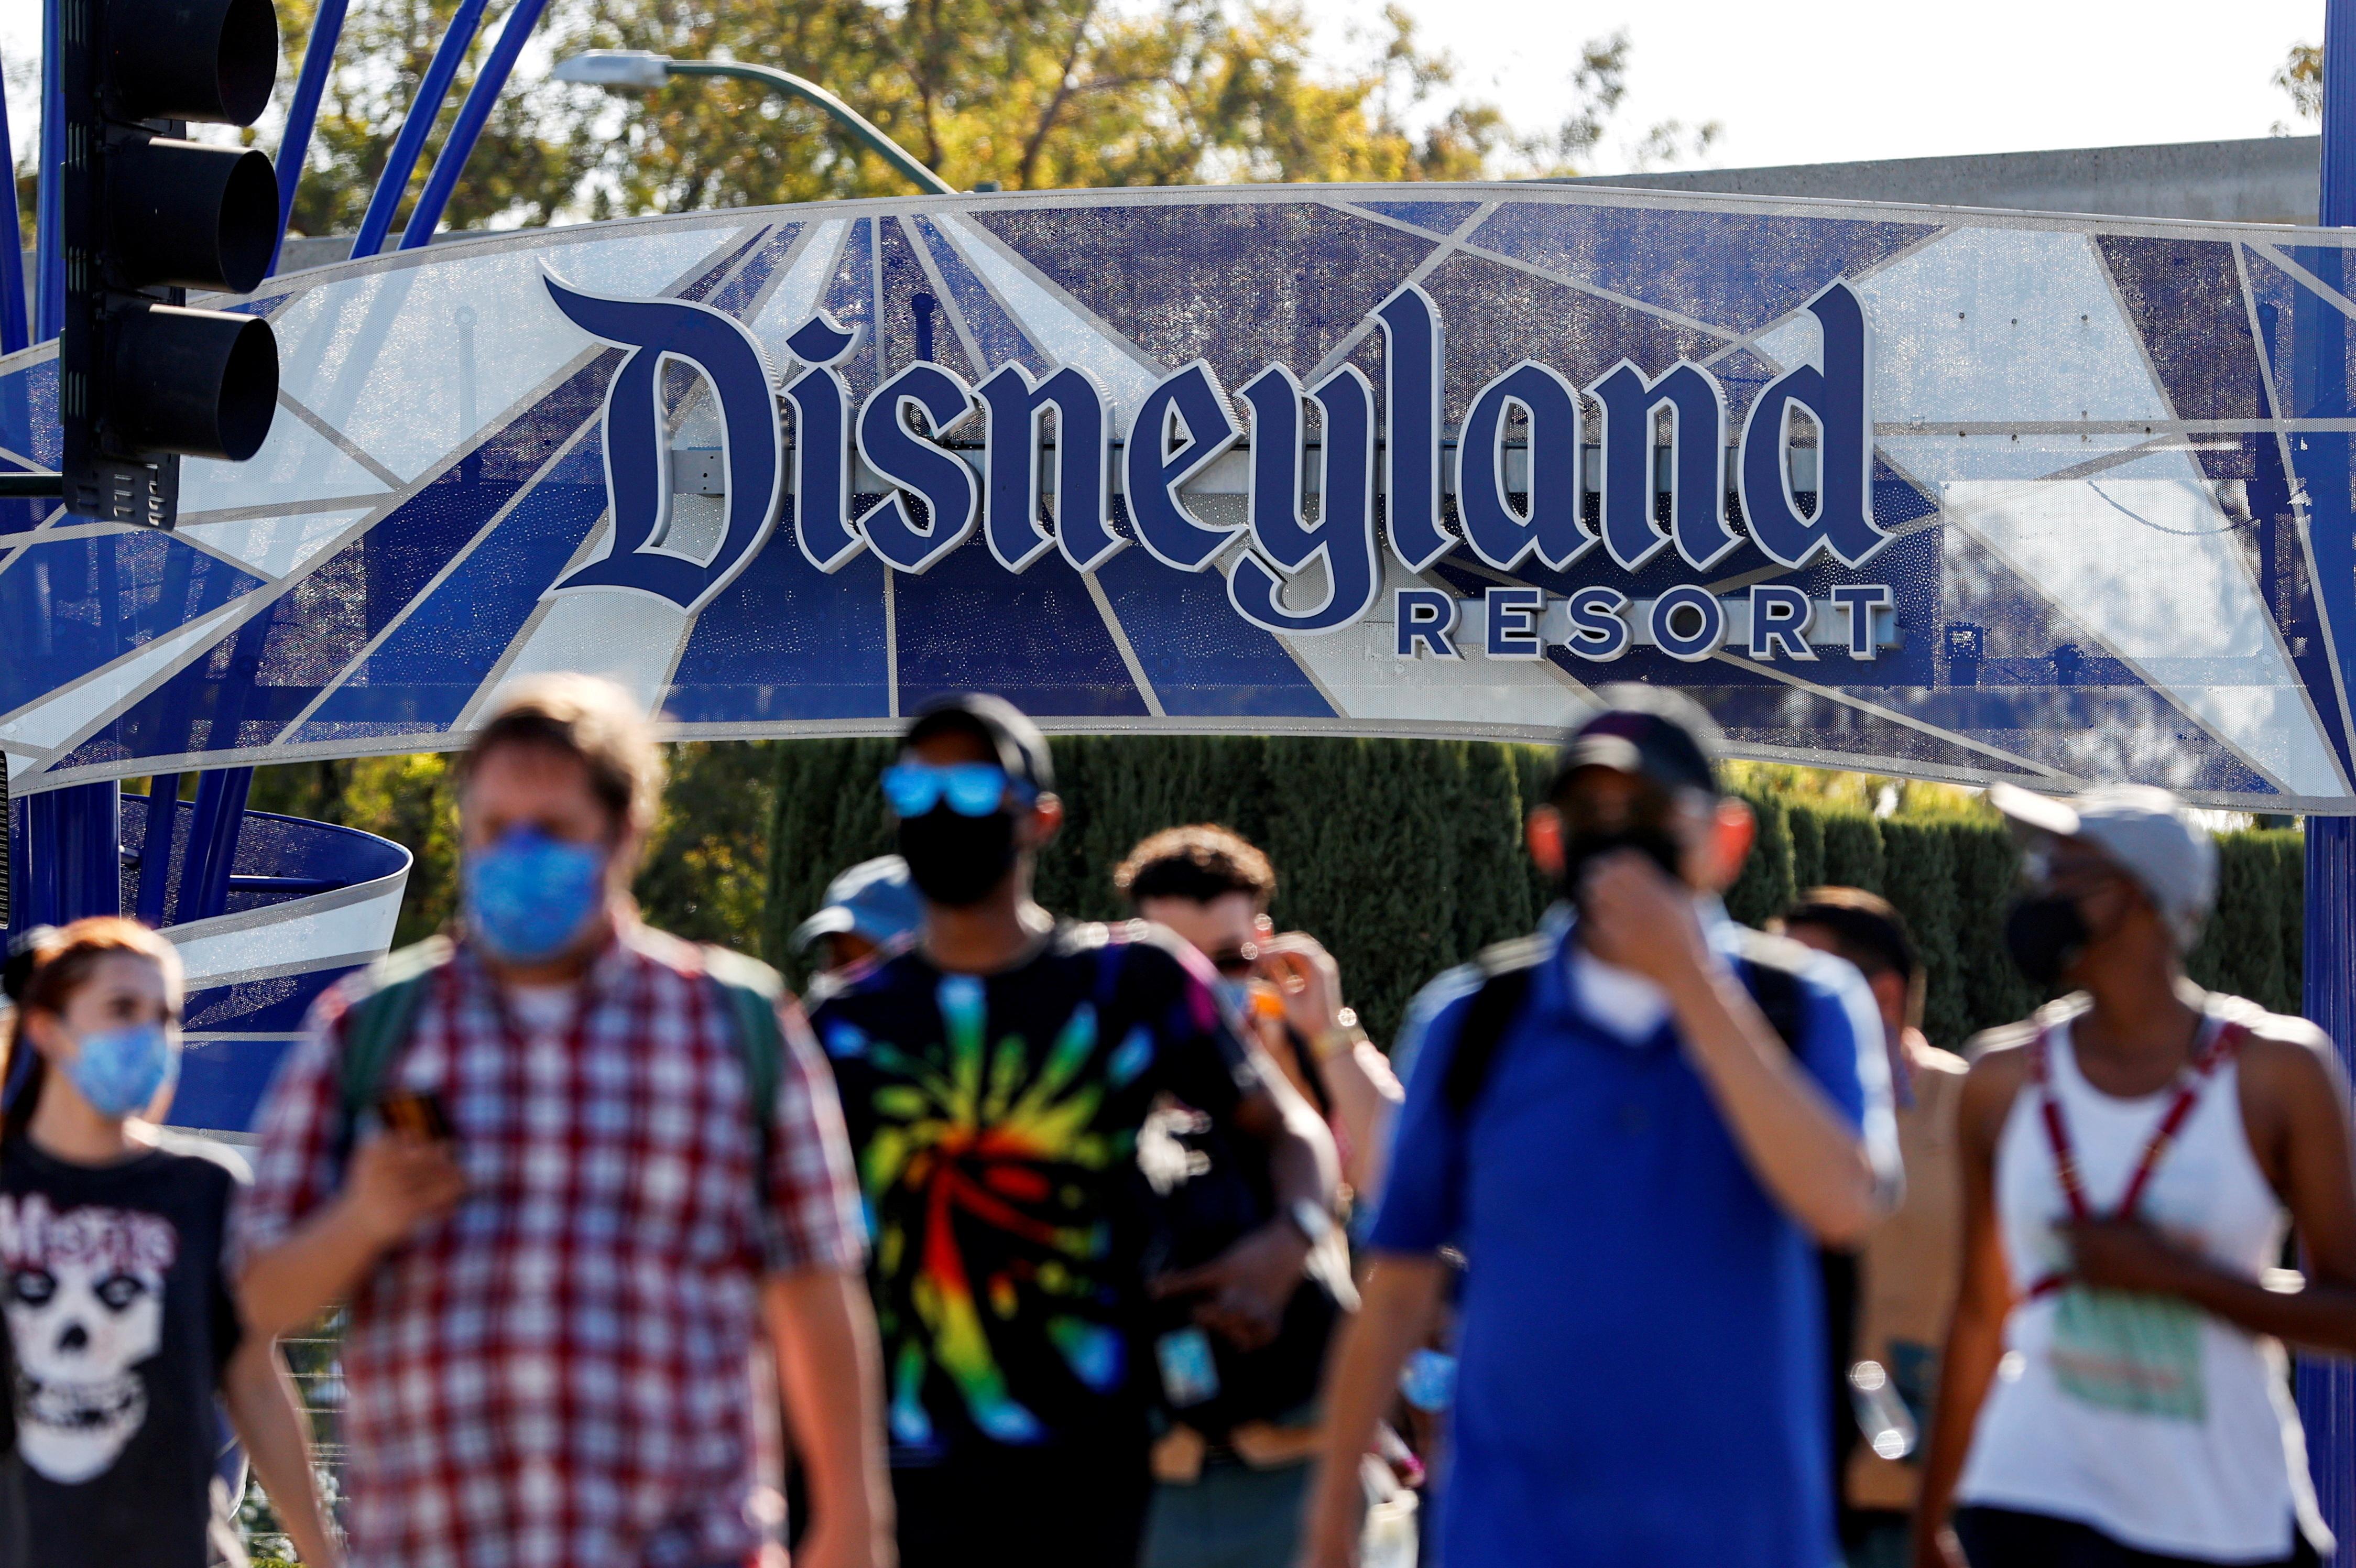 FILE PHOTO: People leave the Disneyland Resort on Disneyland Park and Disney California Adventure's reopening day amidst the coronavirus disease (COVID-19) outbreak, in Anaheim, California, U.S., April 30, 2021.  REUTERS/Mario Anzuoni